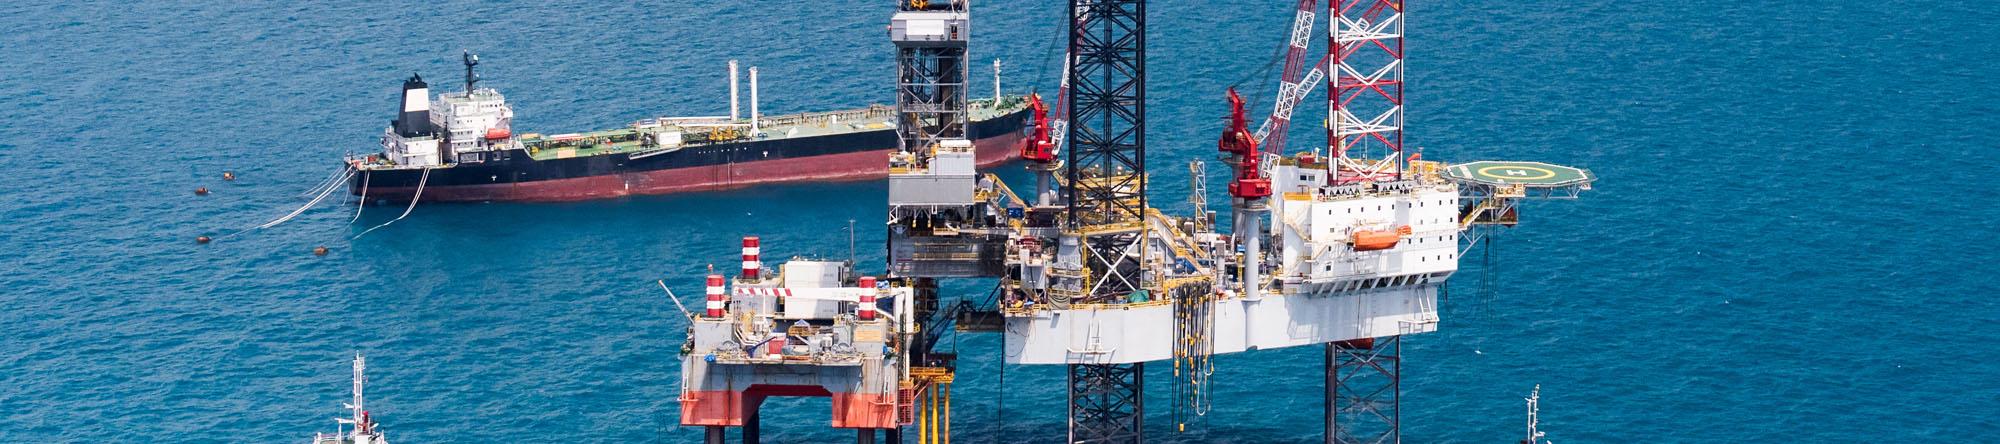 Offshore oil rig drilling platform/Offshore oil rig drilling pla